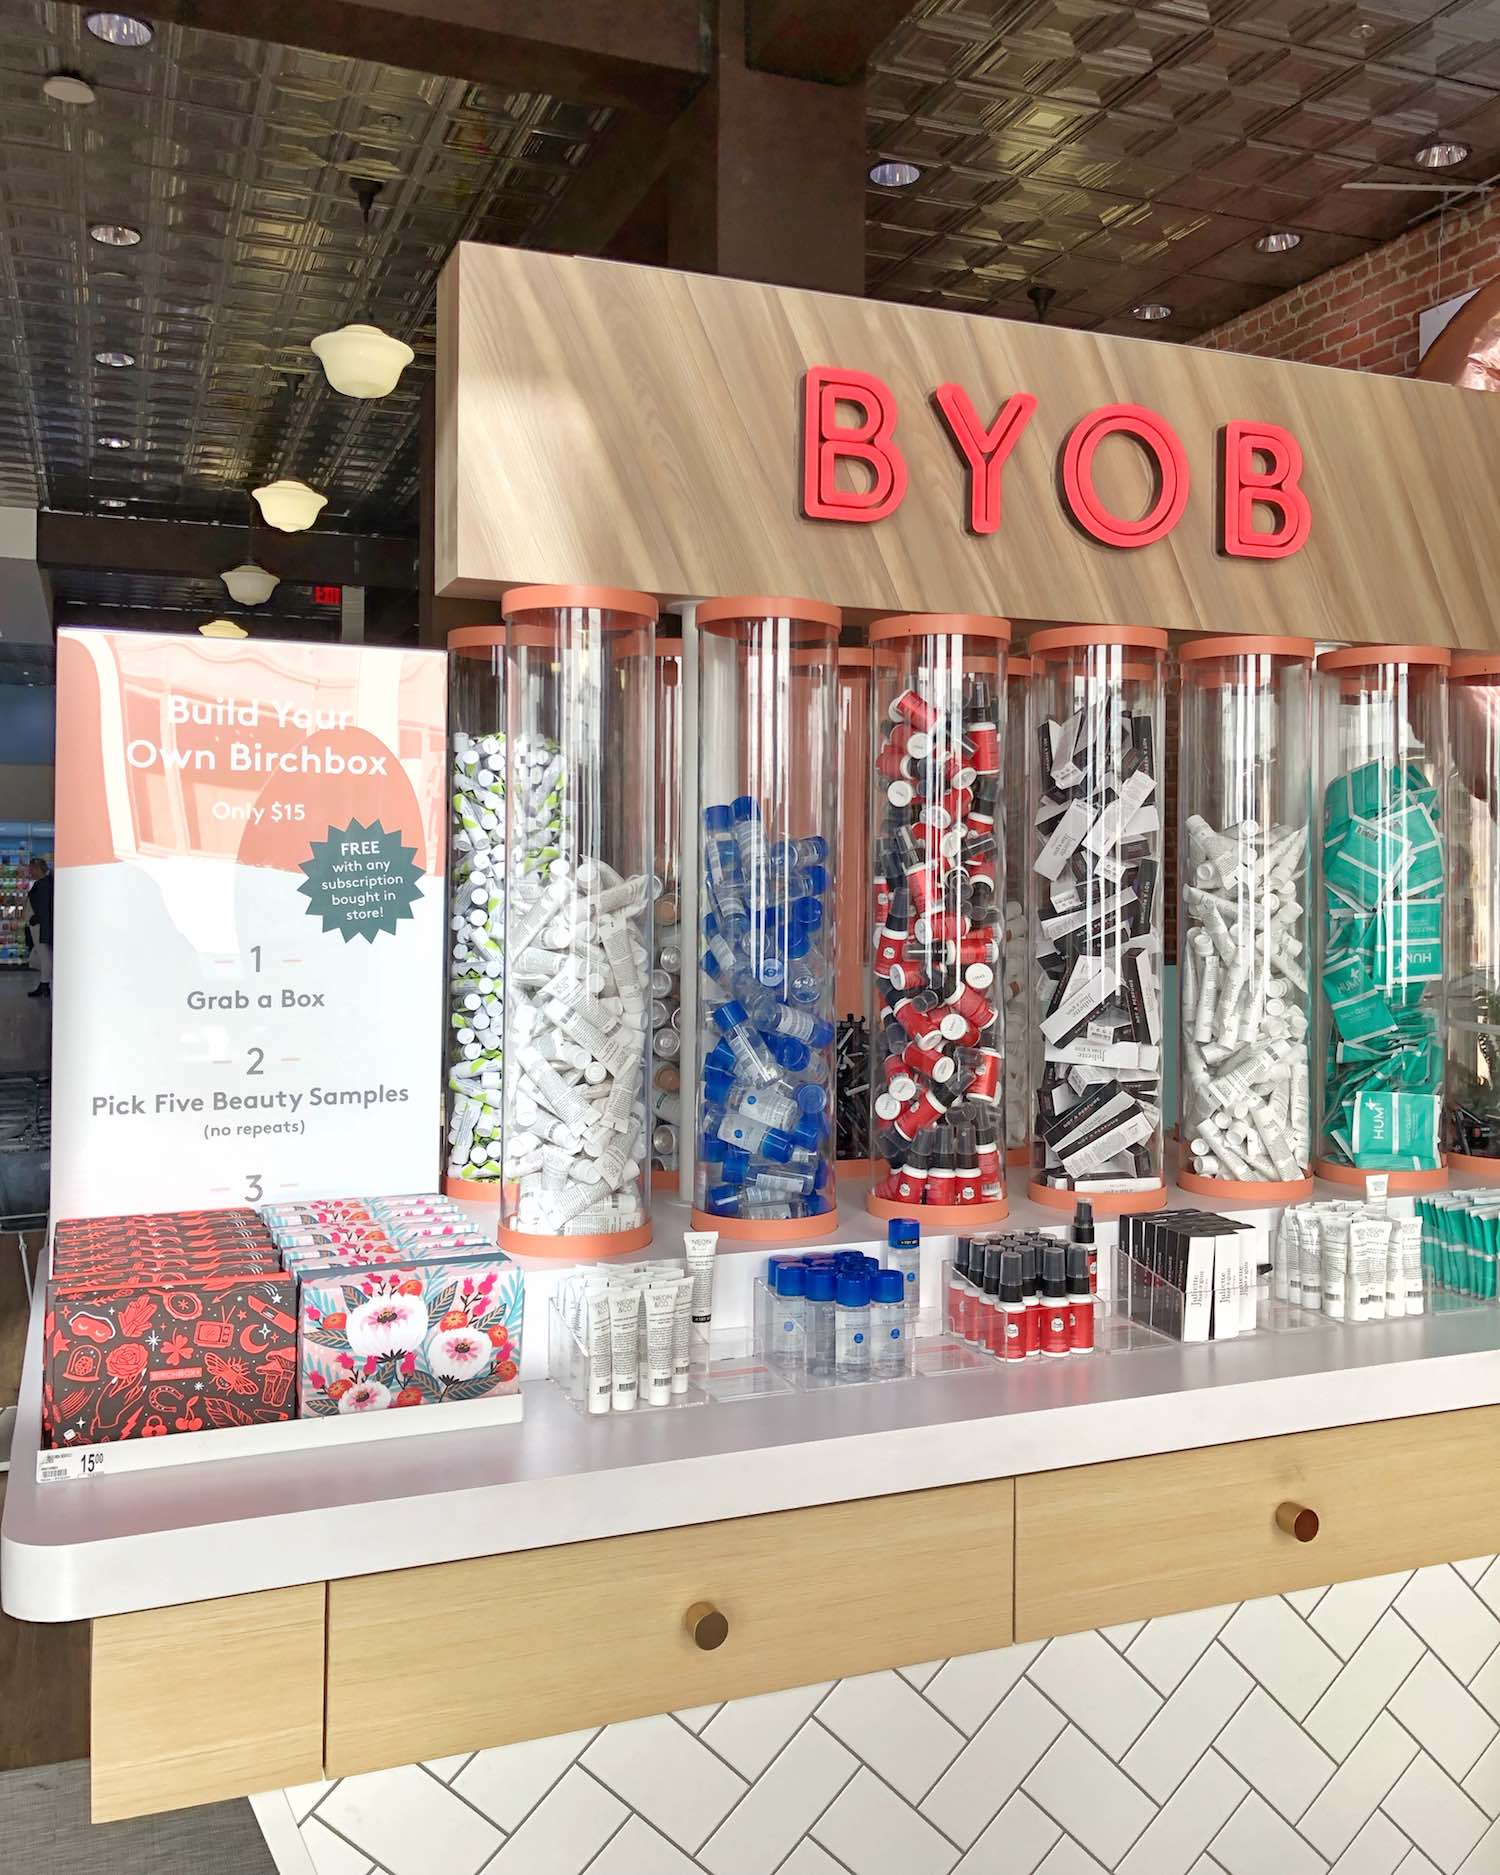 BYOB Birchbox Inside Walgreens